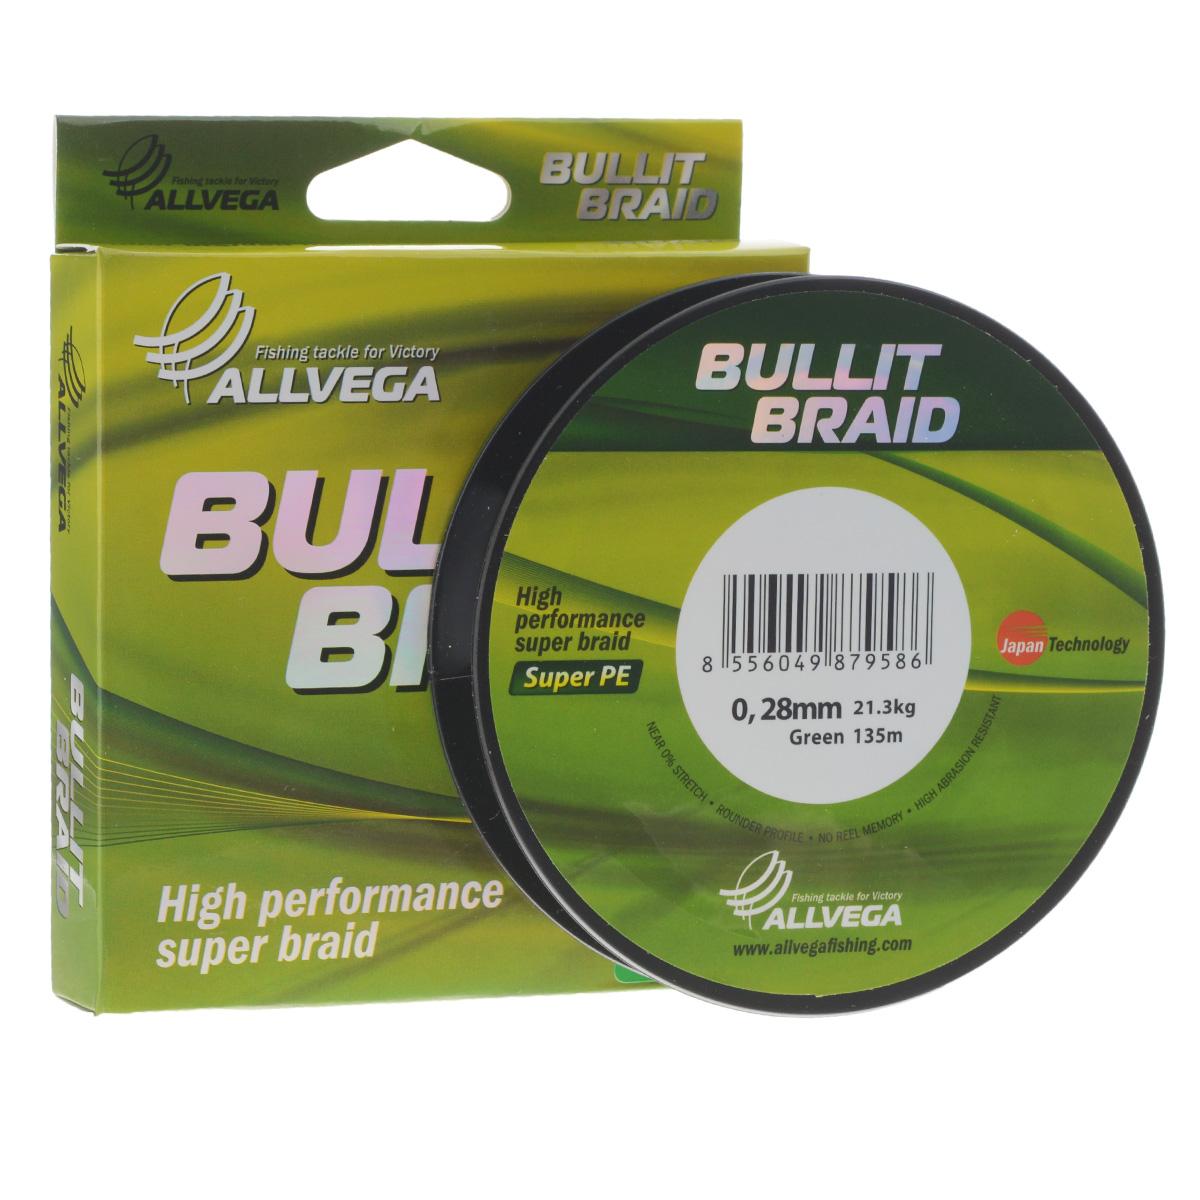 Леска плетеная Allvega Bullit Braid, цвет: темно-зеленый, 135 м, 0,28 мм, 21,3 кг